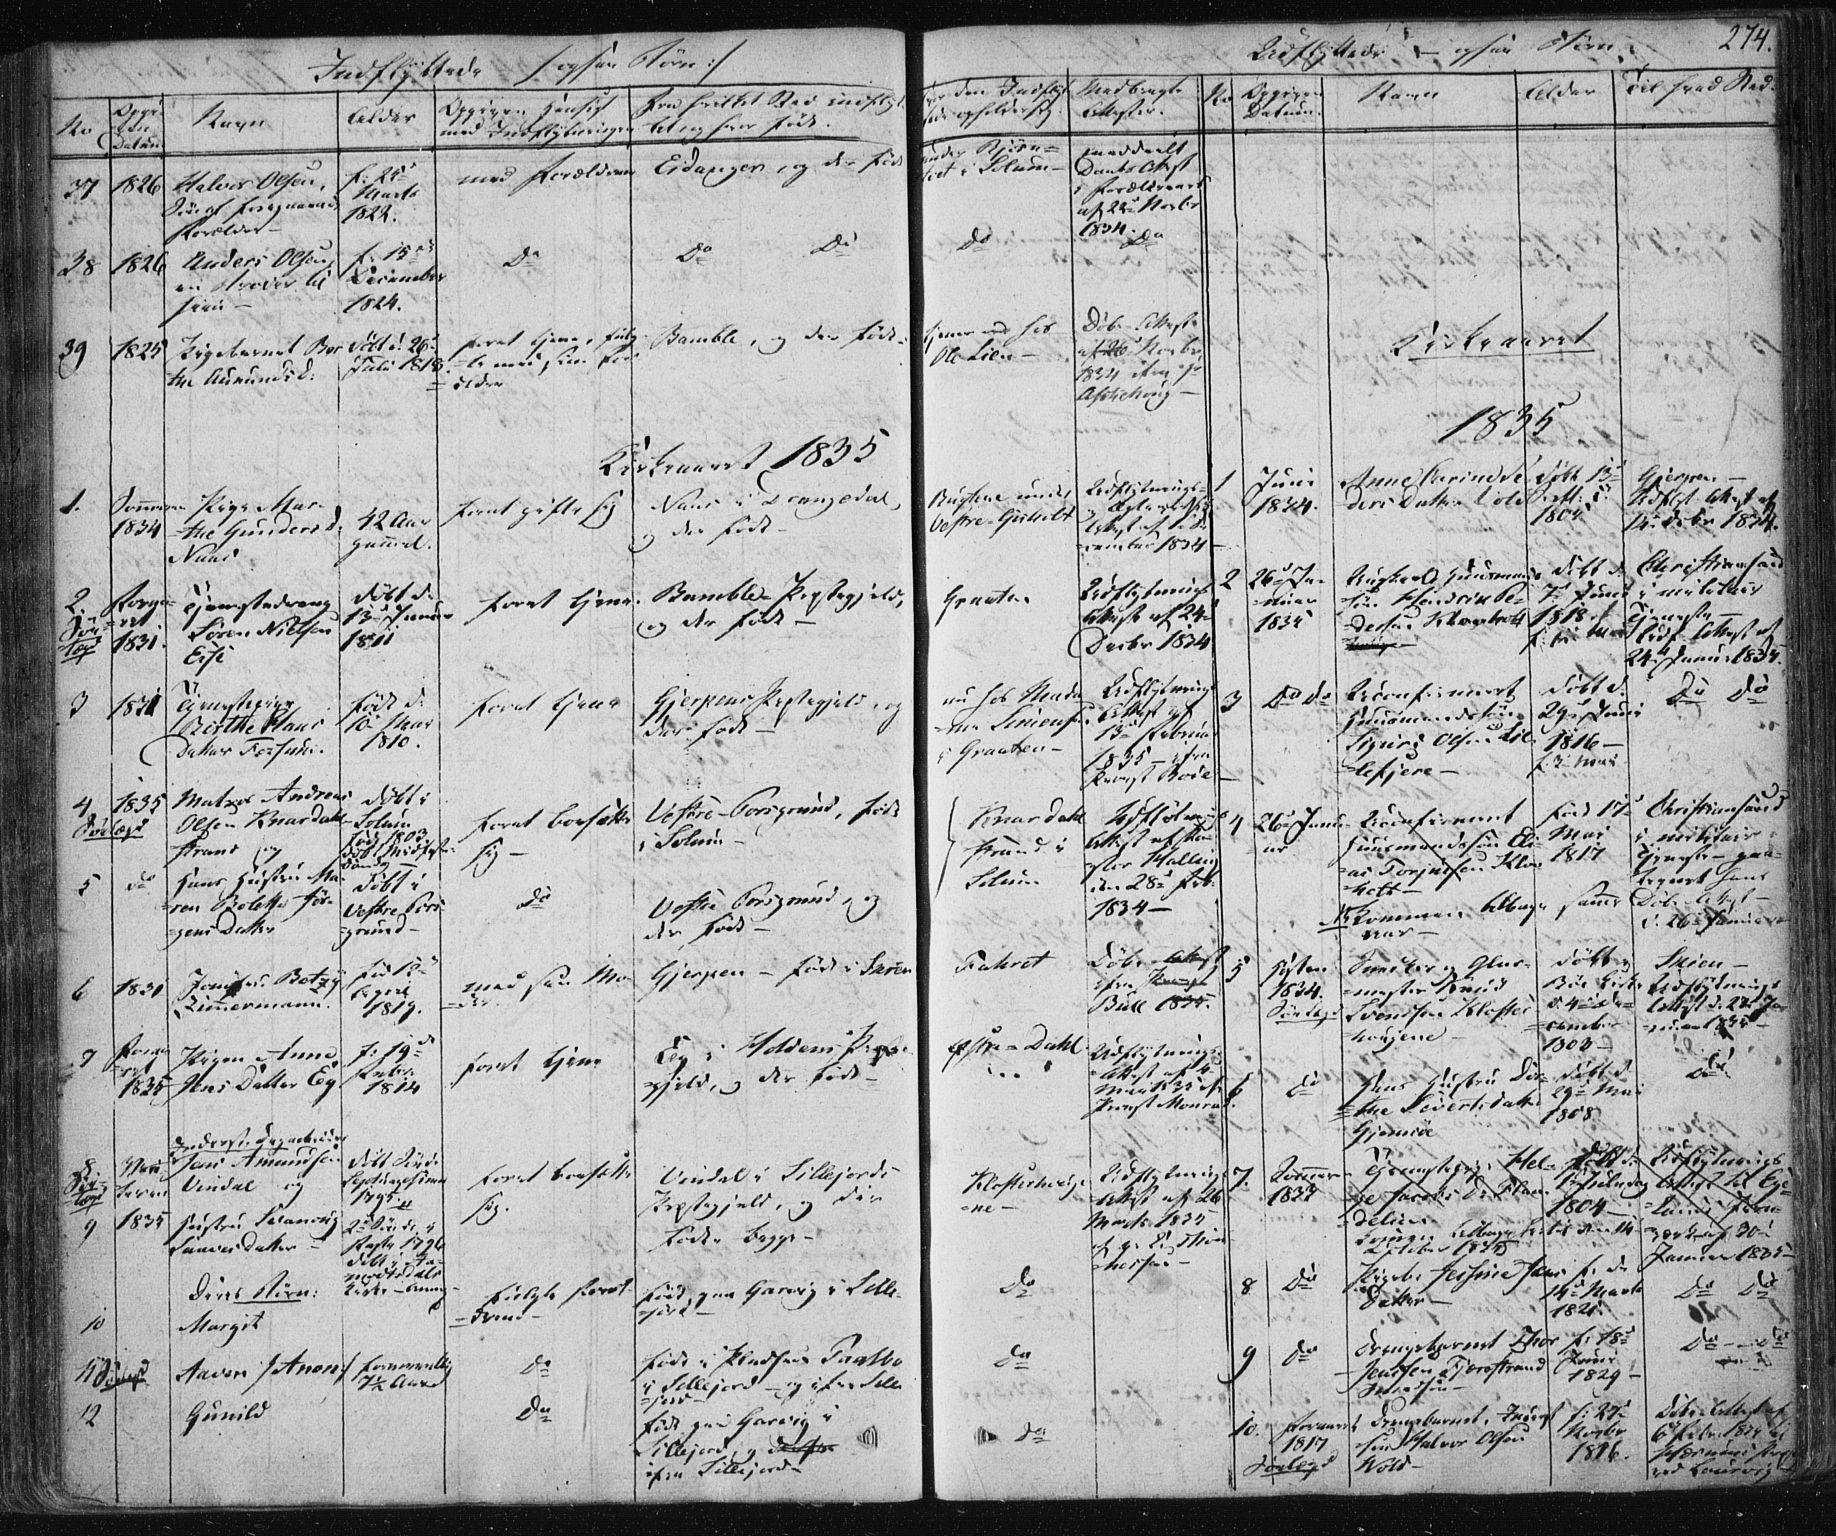 SAKO, Solum kirkebøker, F/Fa/L0005: Ministerialbok nr. I 5, 1833-1843, s. 274